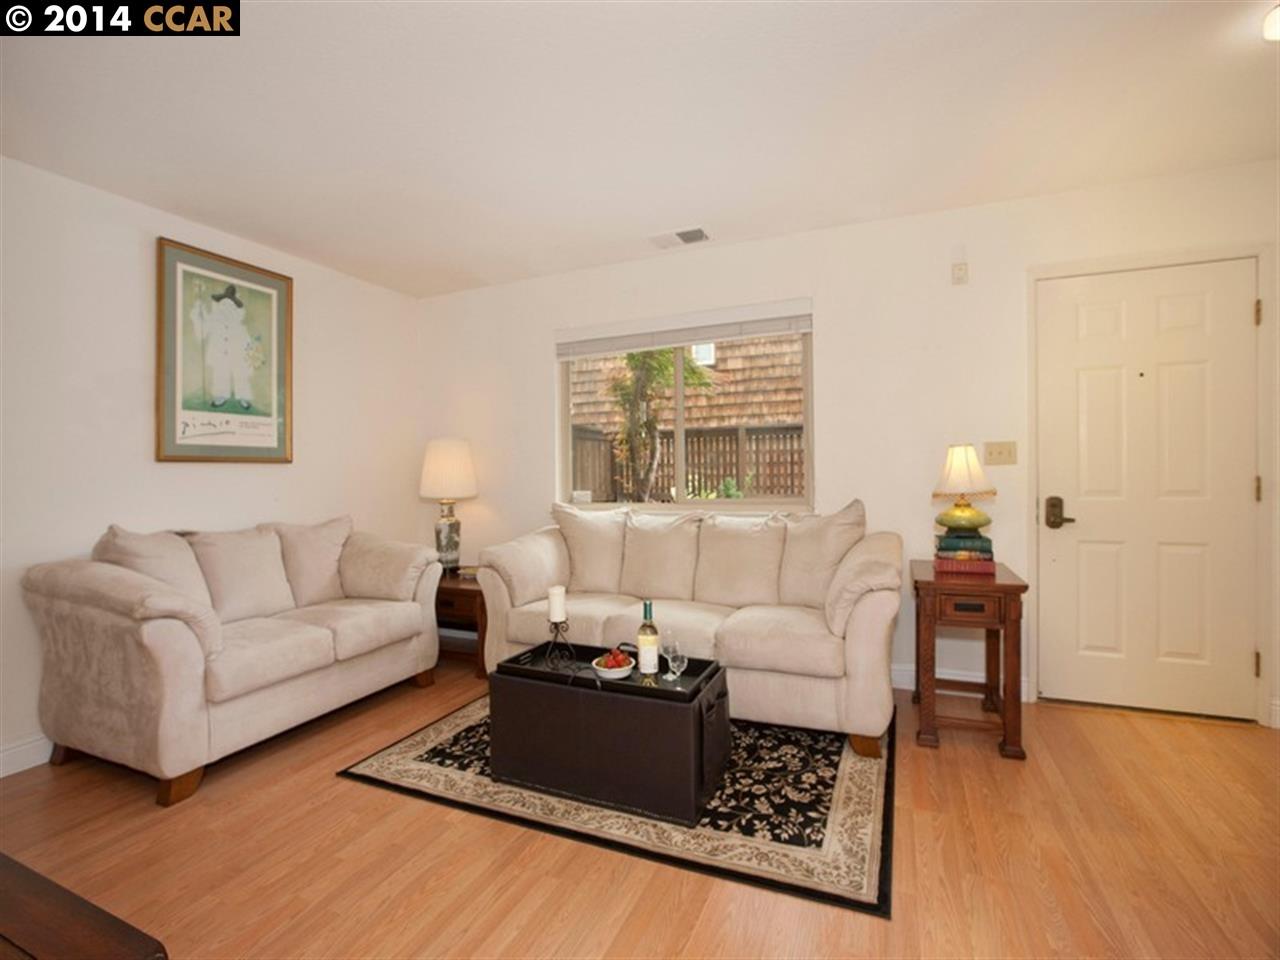 Additional photo for property listing at 225 Mayhew Way  Walnut Creek, カリフォルニア 94597 アメリカ合衆国